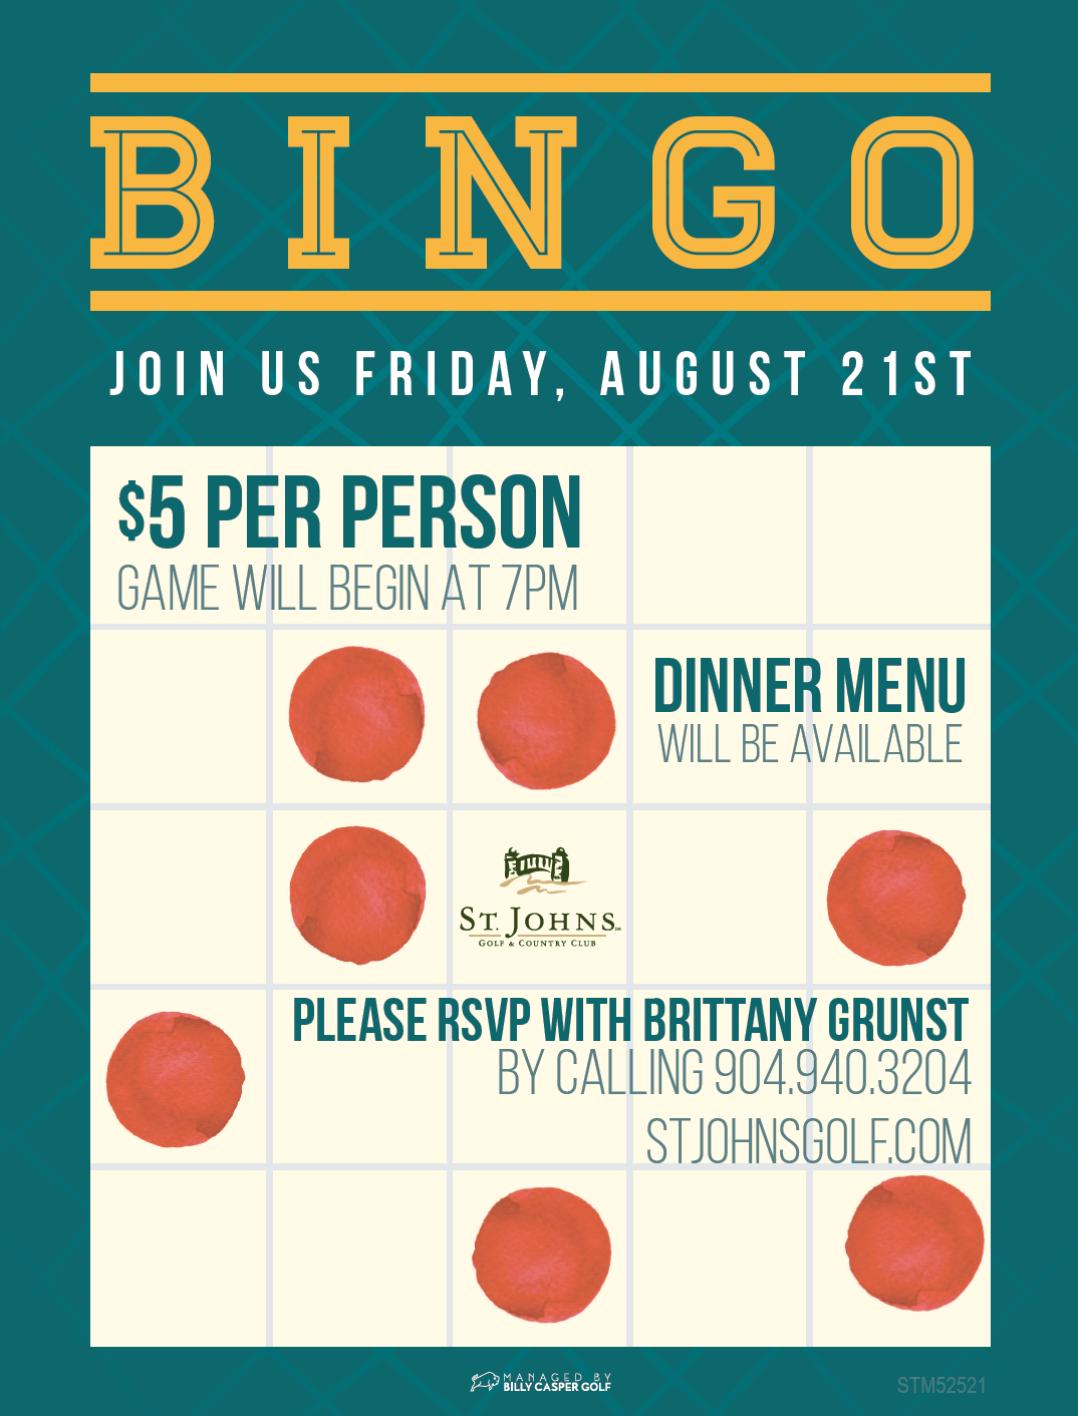 Bingo St. Johns Golf & Country Club